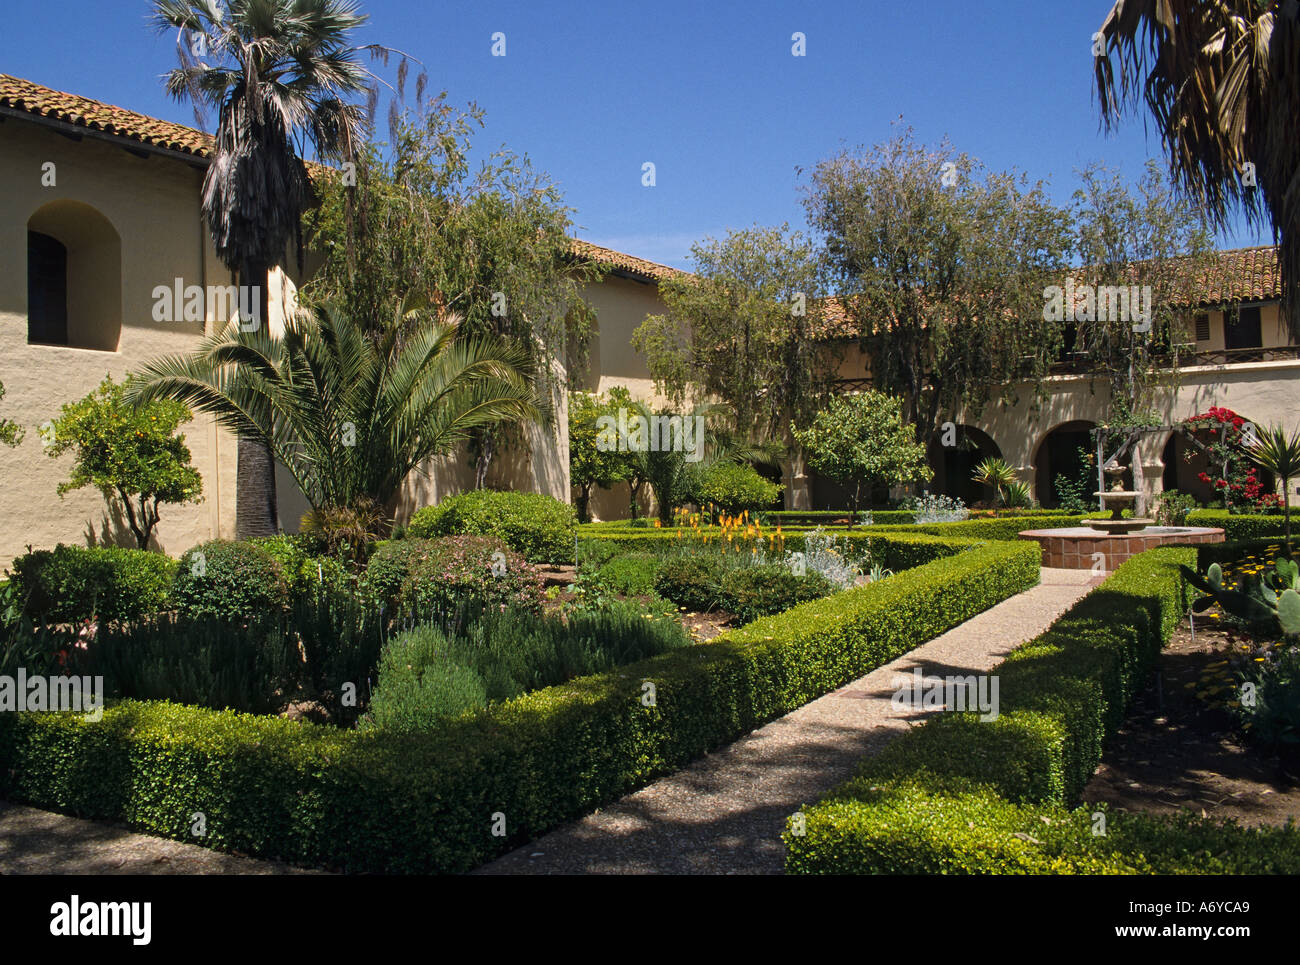 California San Miguel Arcangel Mission Garden